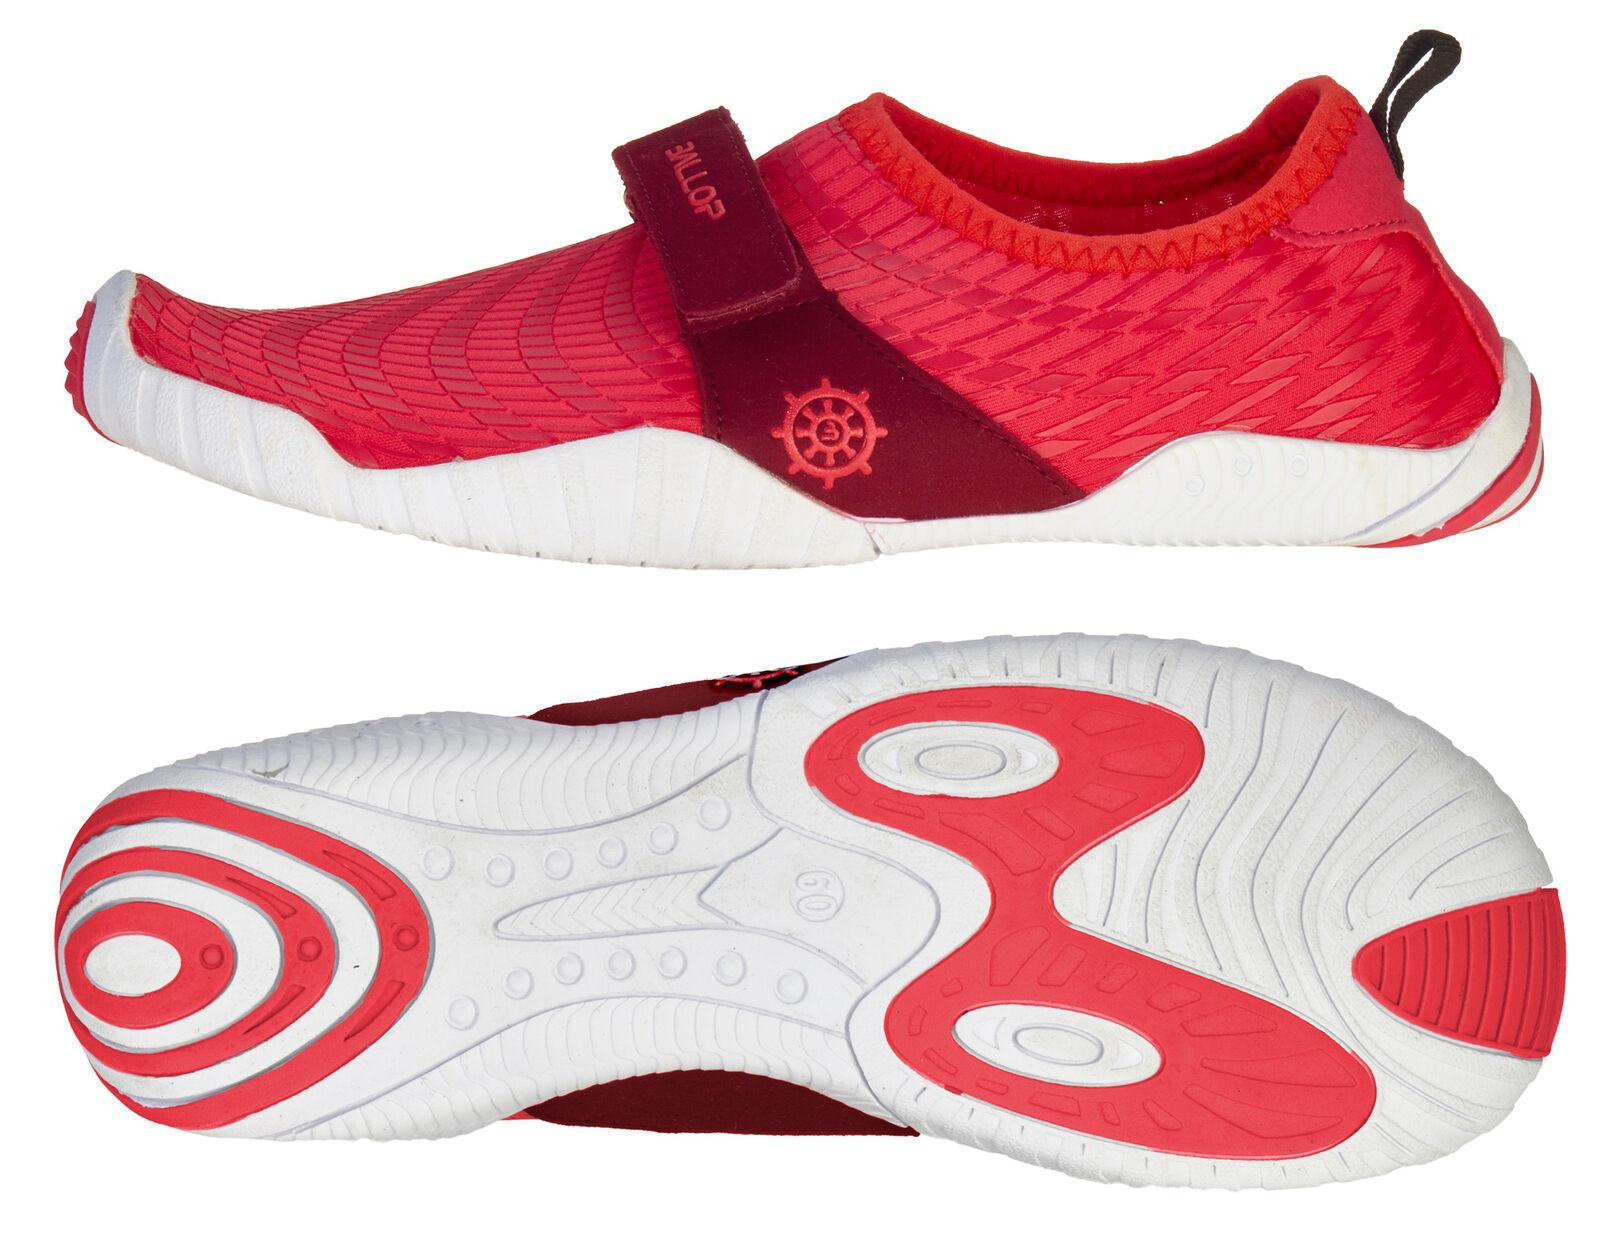 BALLOP Schuhe  Patrol rot , V2-Sohle - Barfußschuh - Funktionsschuh